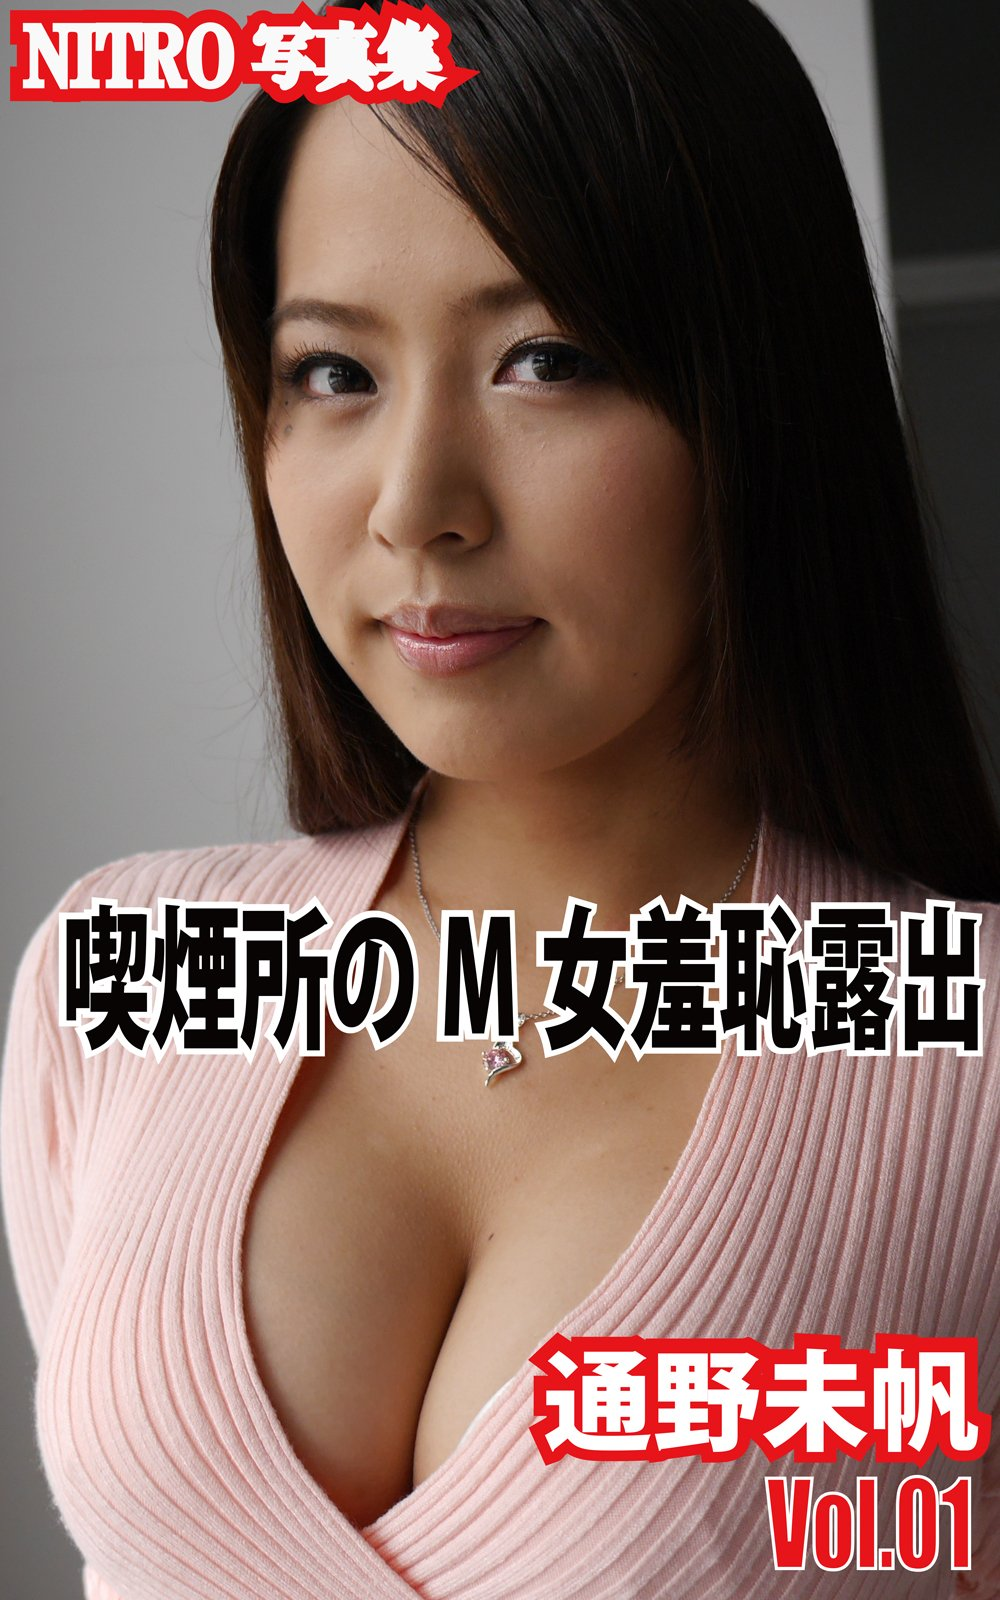 Nitorosyashinnsyusyuchishinnrosyututoonomihoboruni (Japanese Edition)